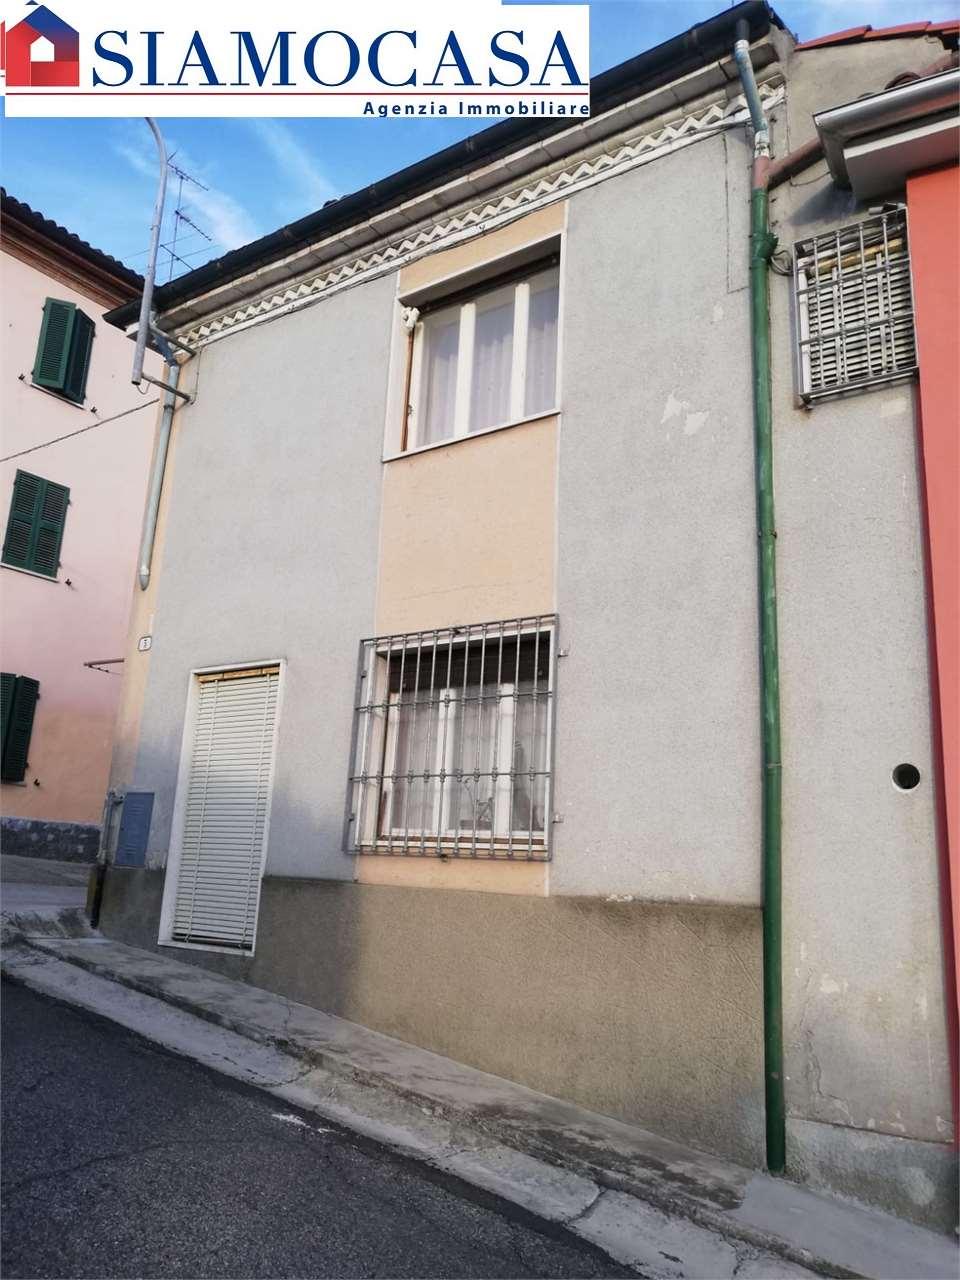 Vendita Casa Indipendente Casa/Villa Alessandria 231588